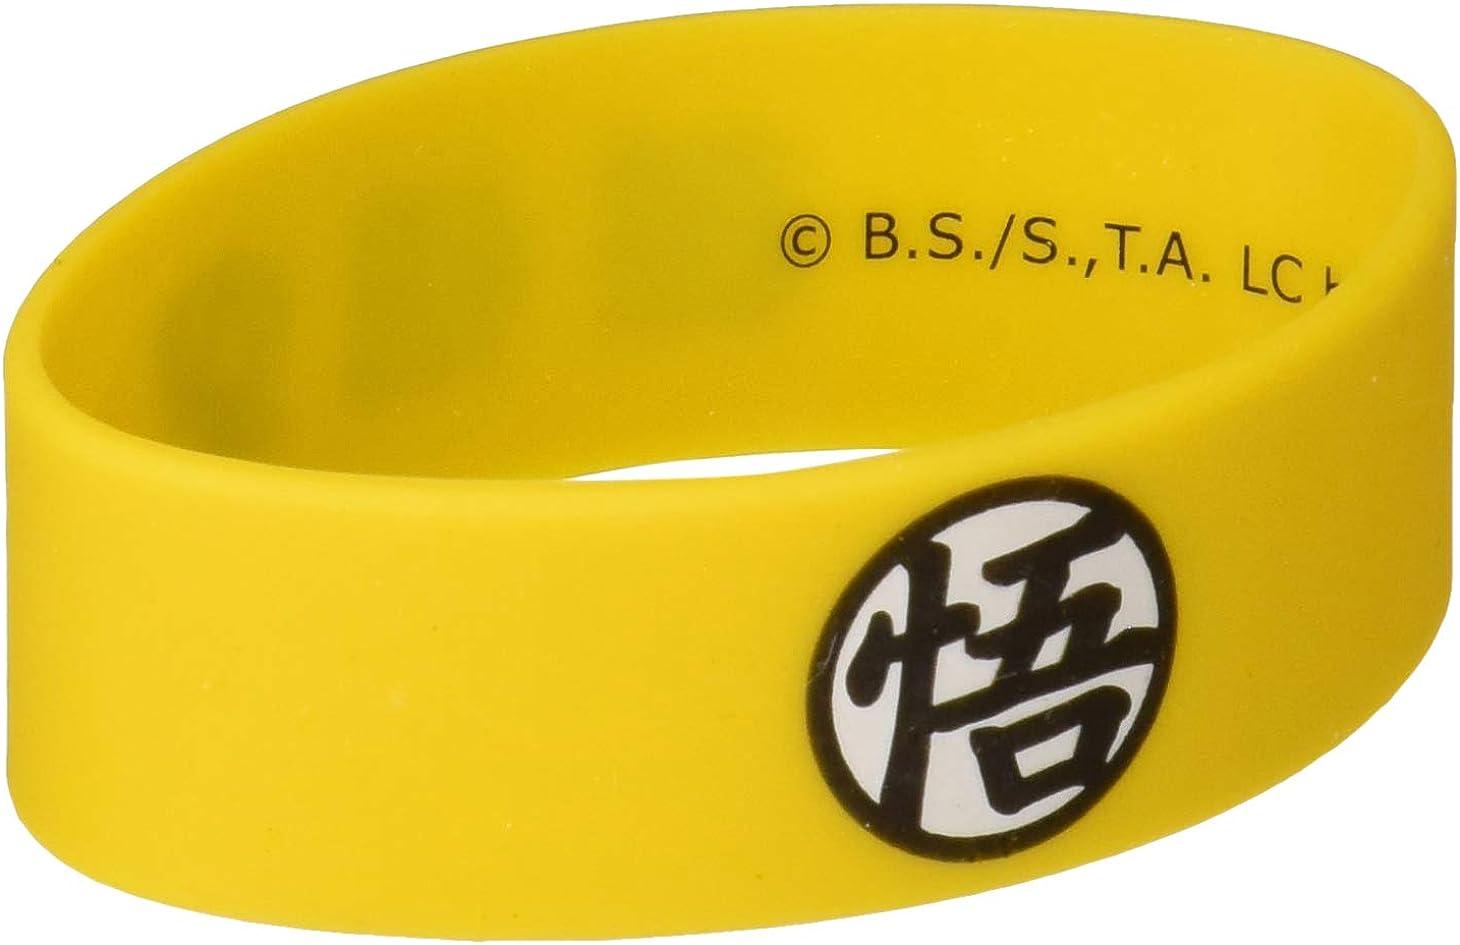 Dragon Ball Super Symbol Wristband Set of 4 Miniature Novelty Toys,,